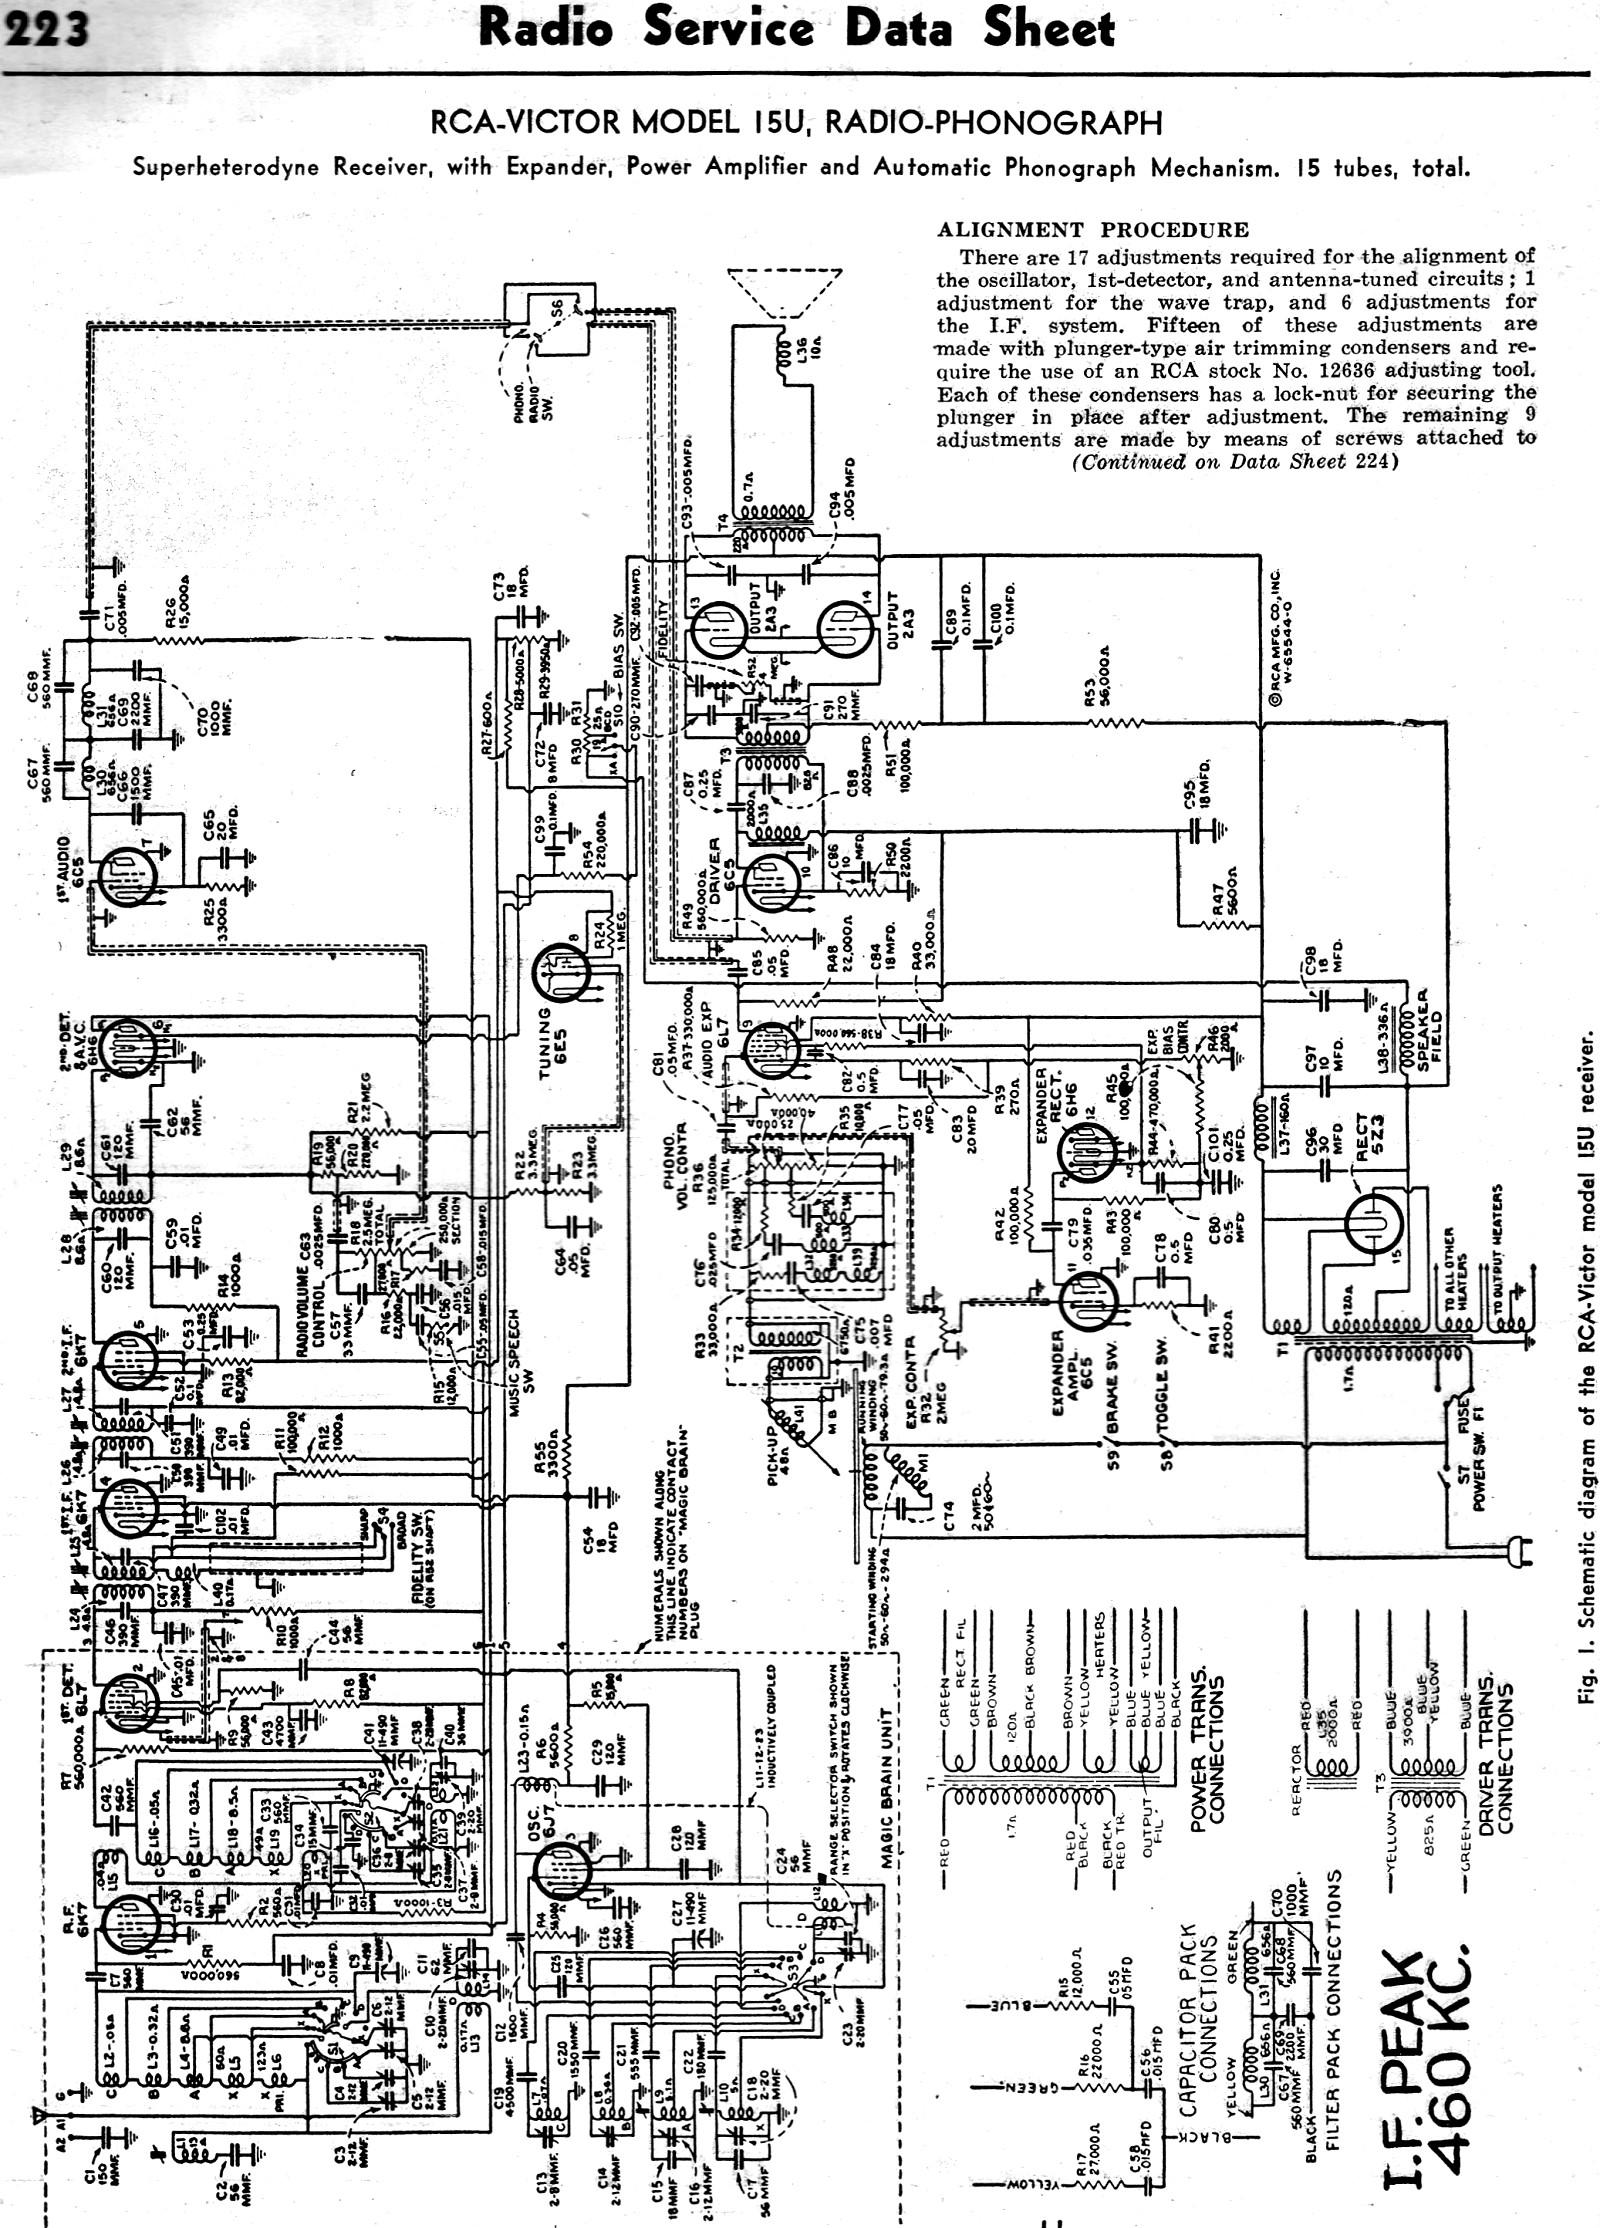 Rca Victor Model 15u Radio Phonograph April Radio